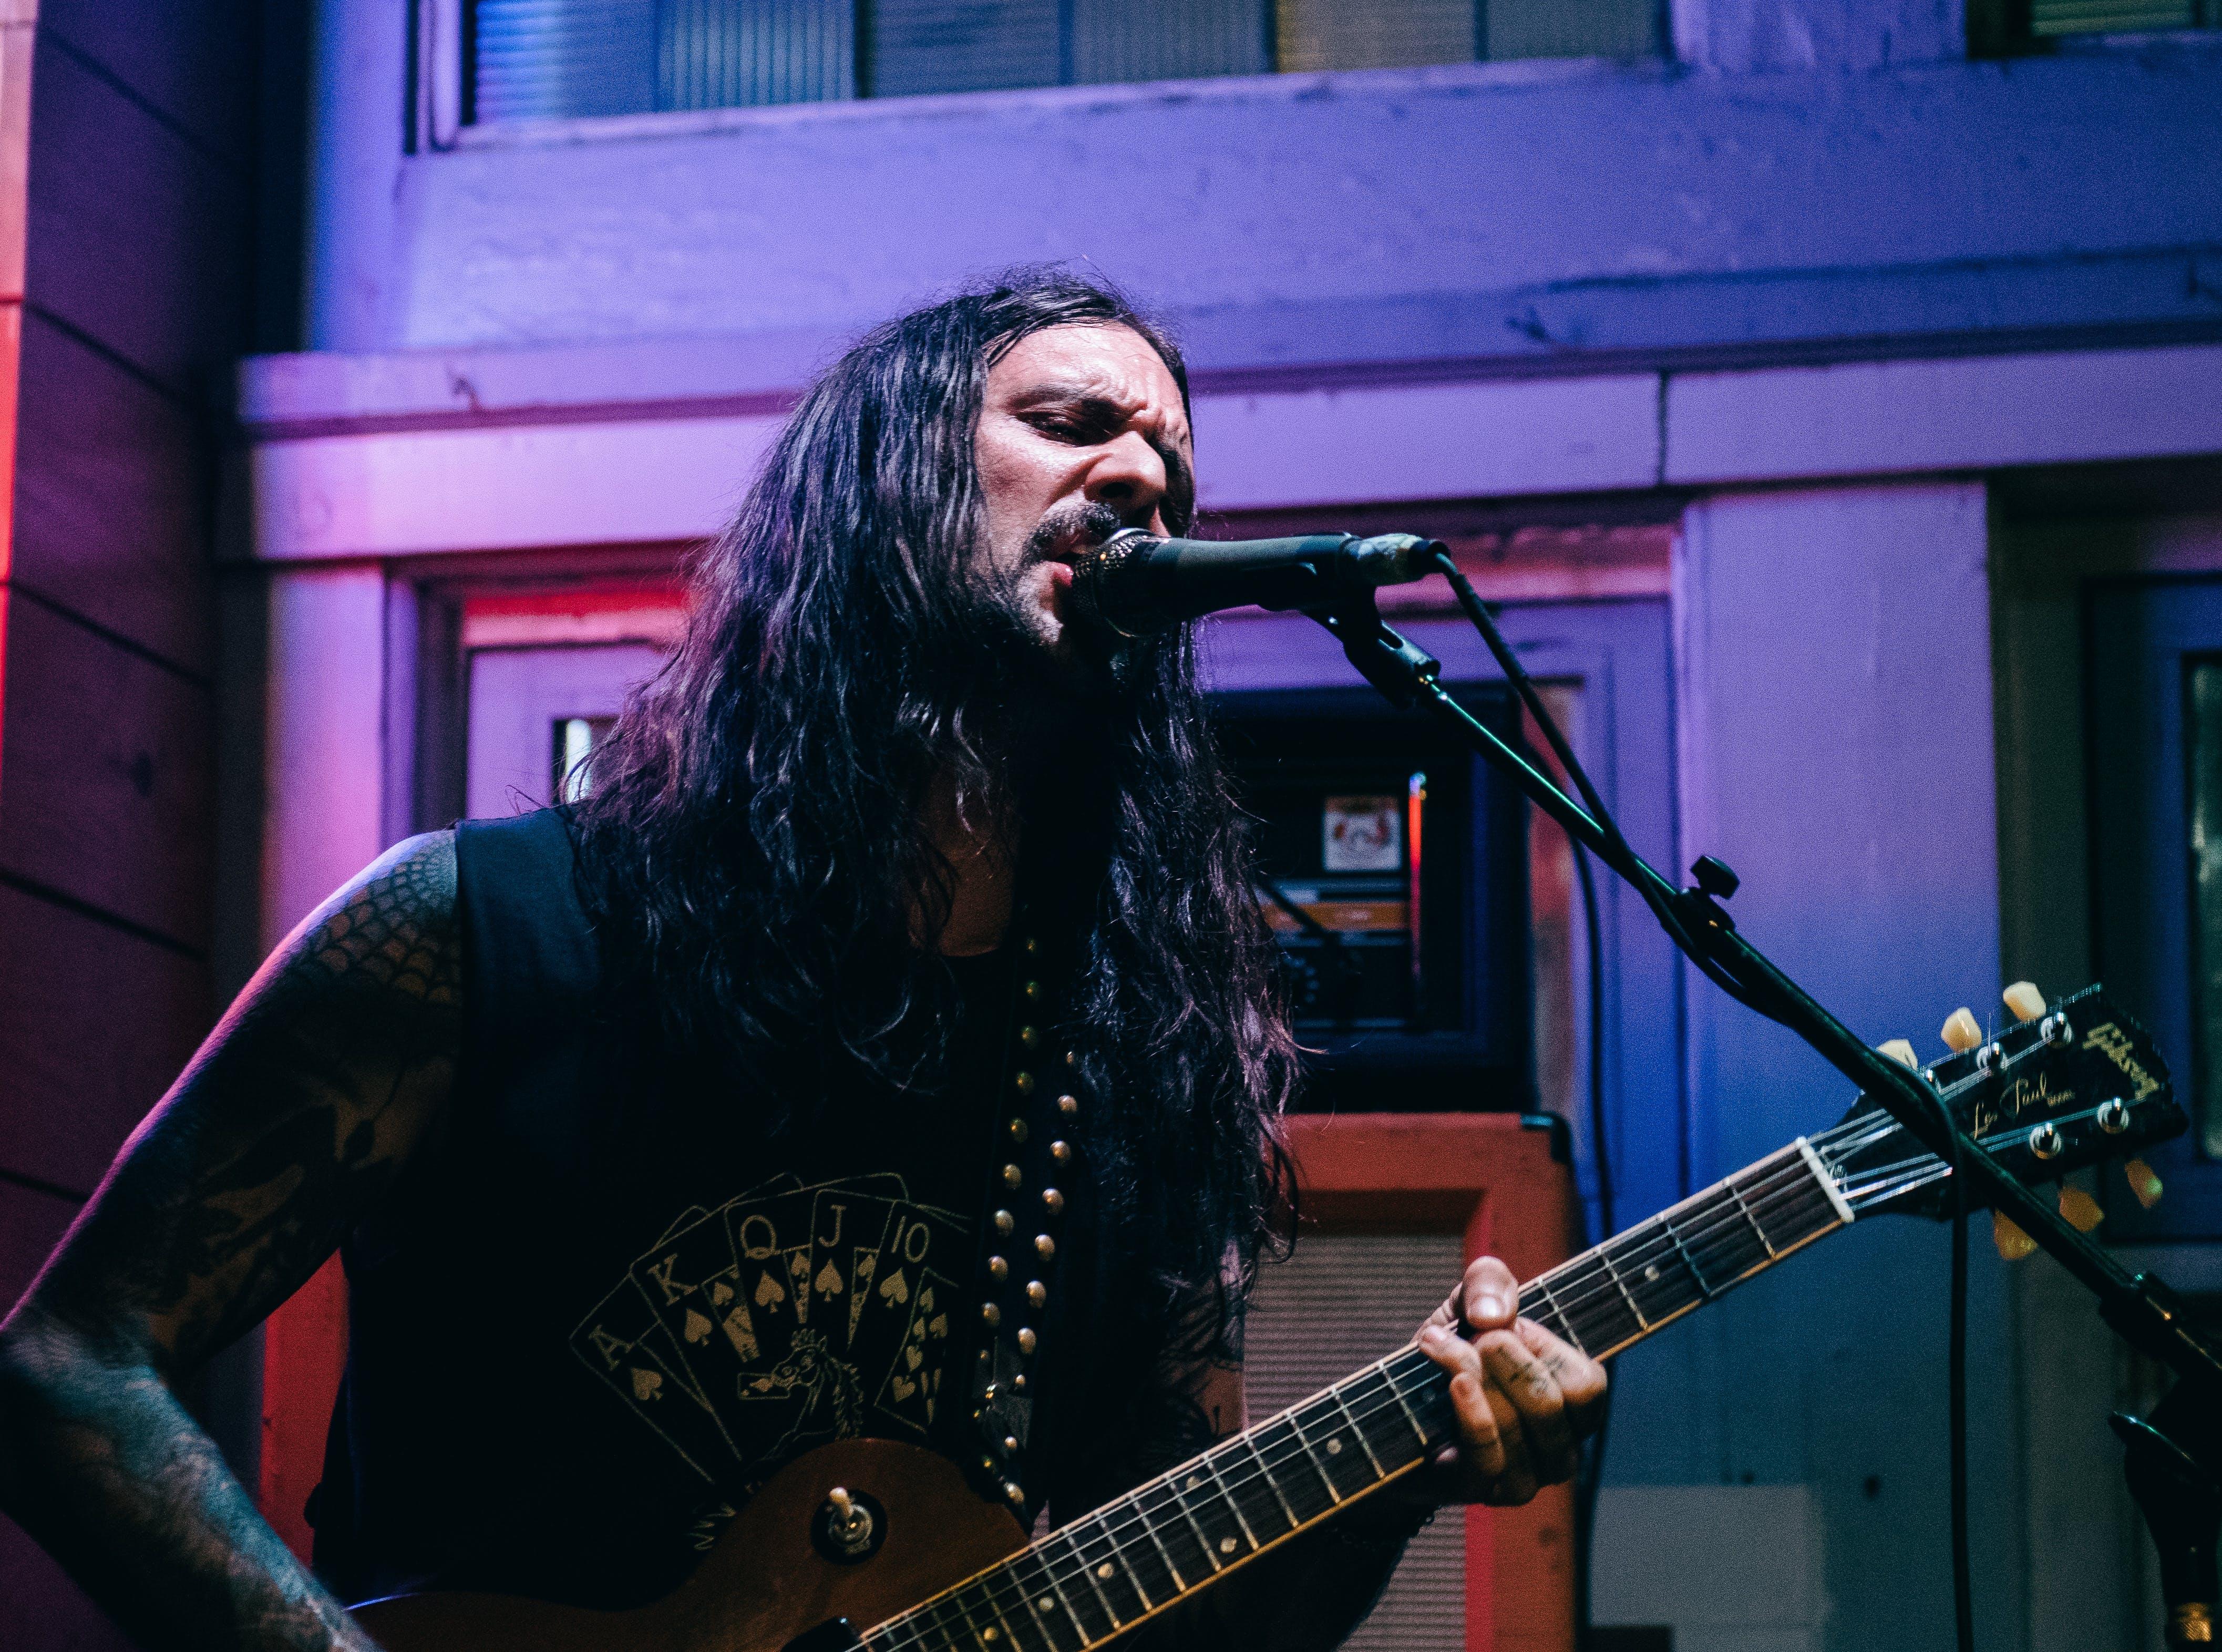 sxsw, エレキギター, ギター, グランジの無料の写真素材